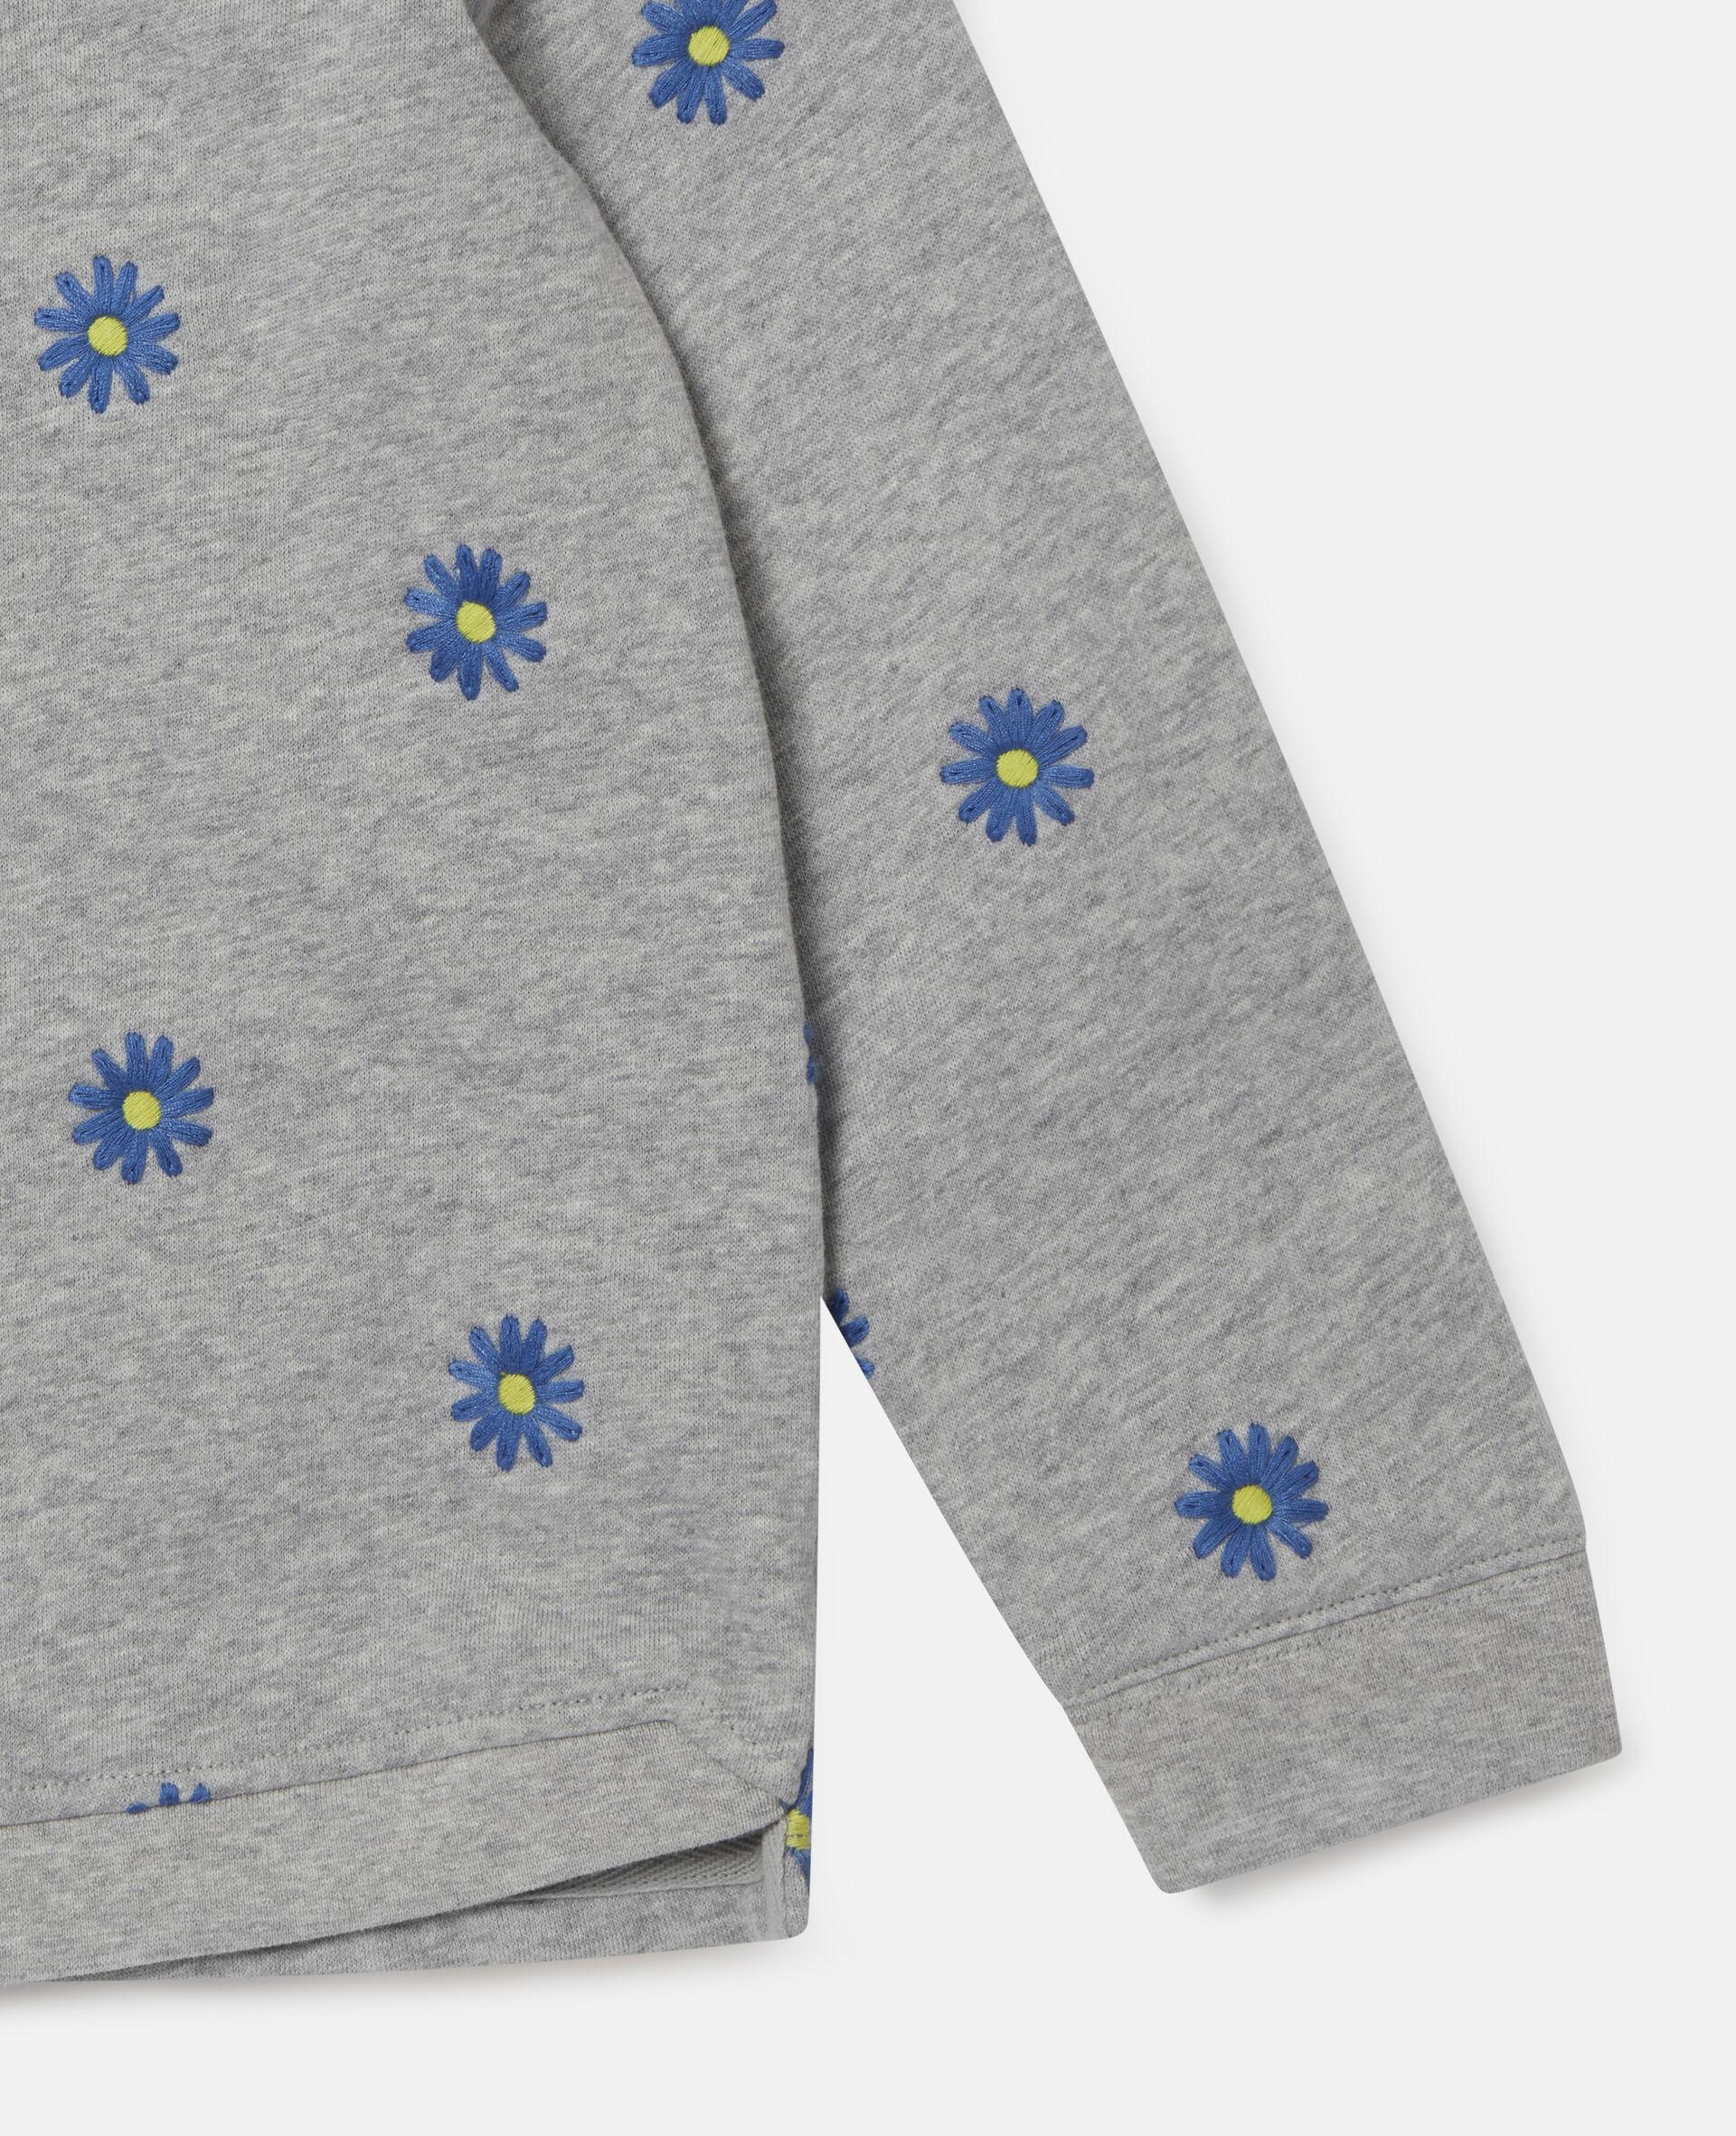 Embroidered Daisies Cotton Fleece Sweatshirt -Grey-large image number 2